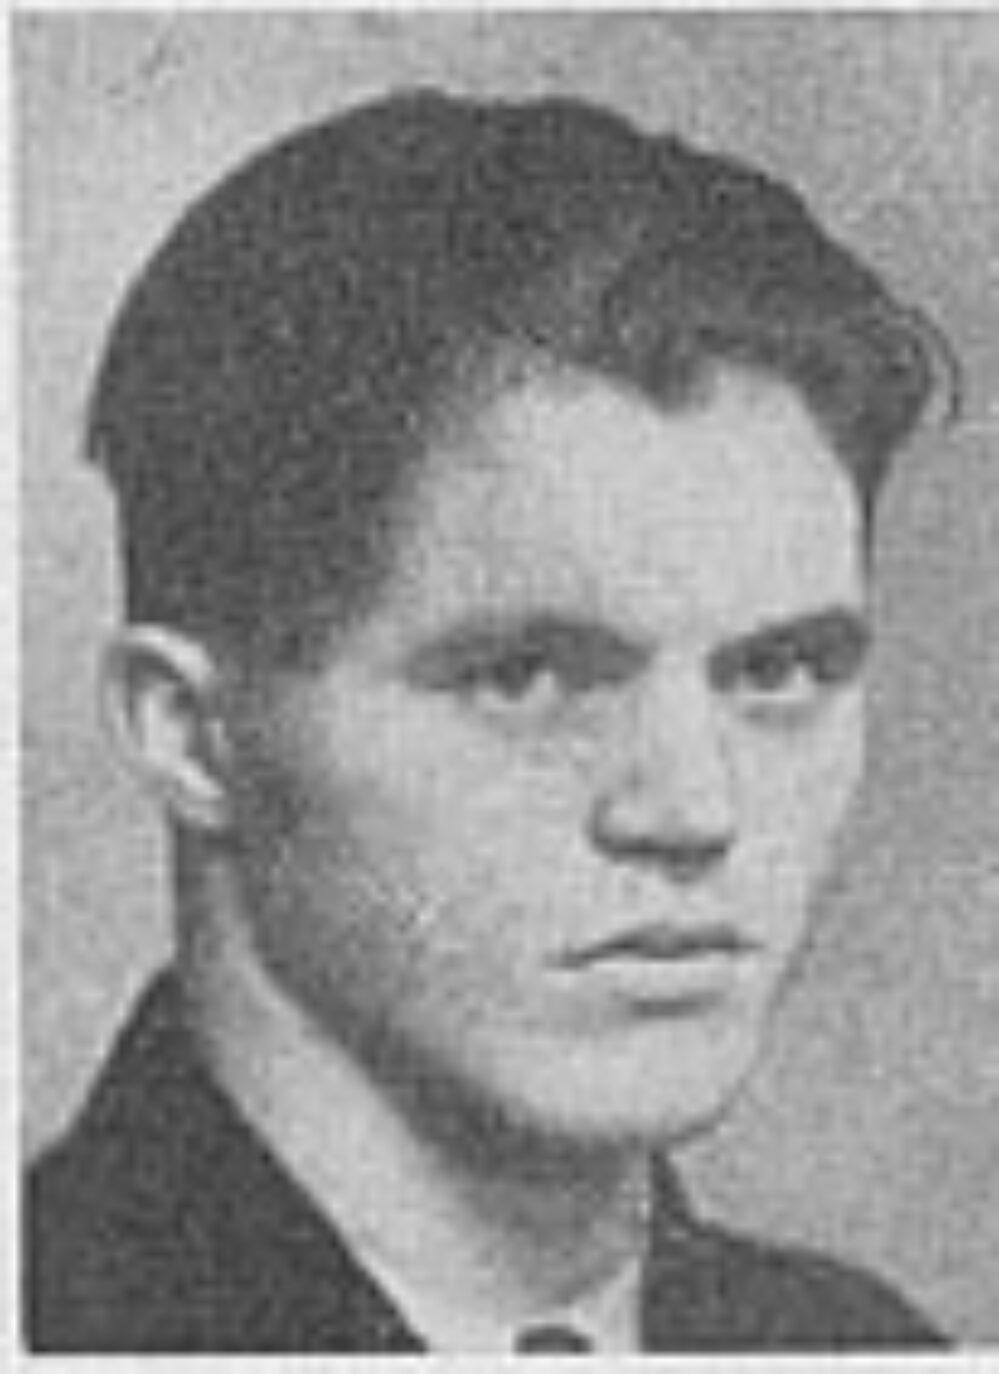 Ingvard Peder Olander Jørgensen